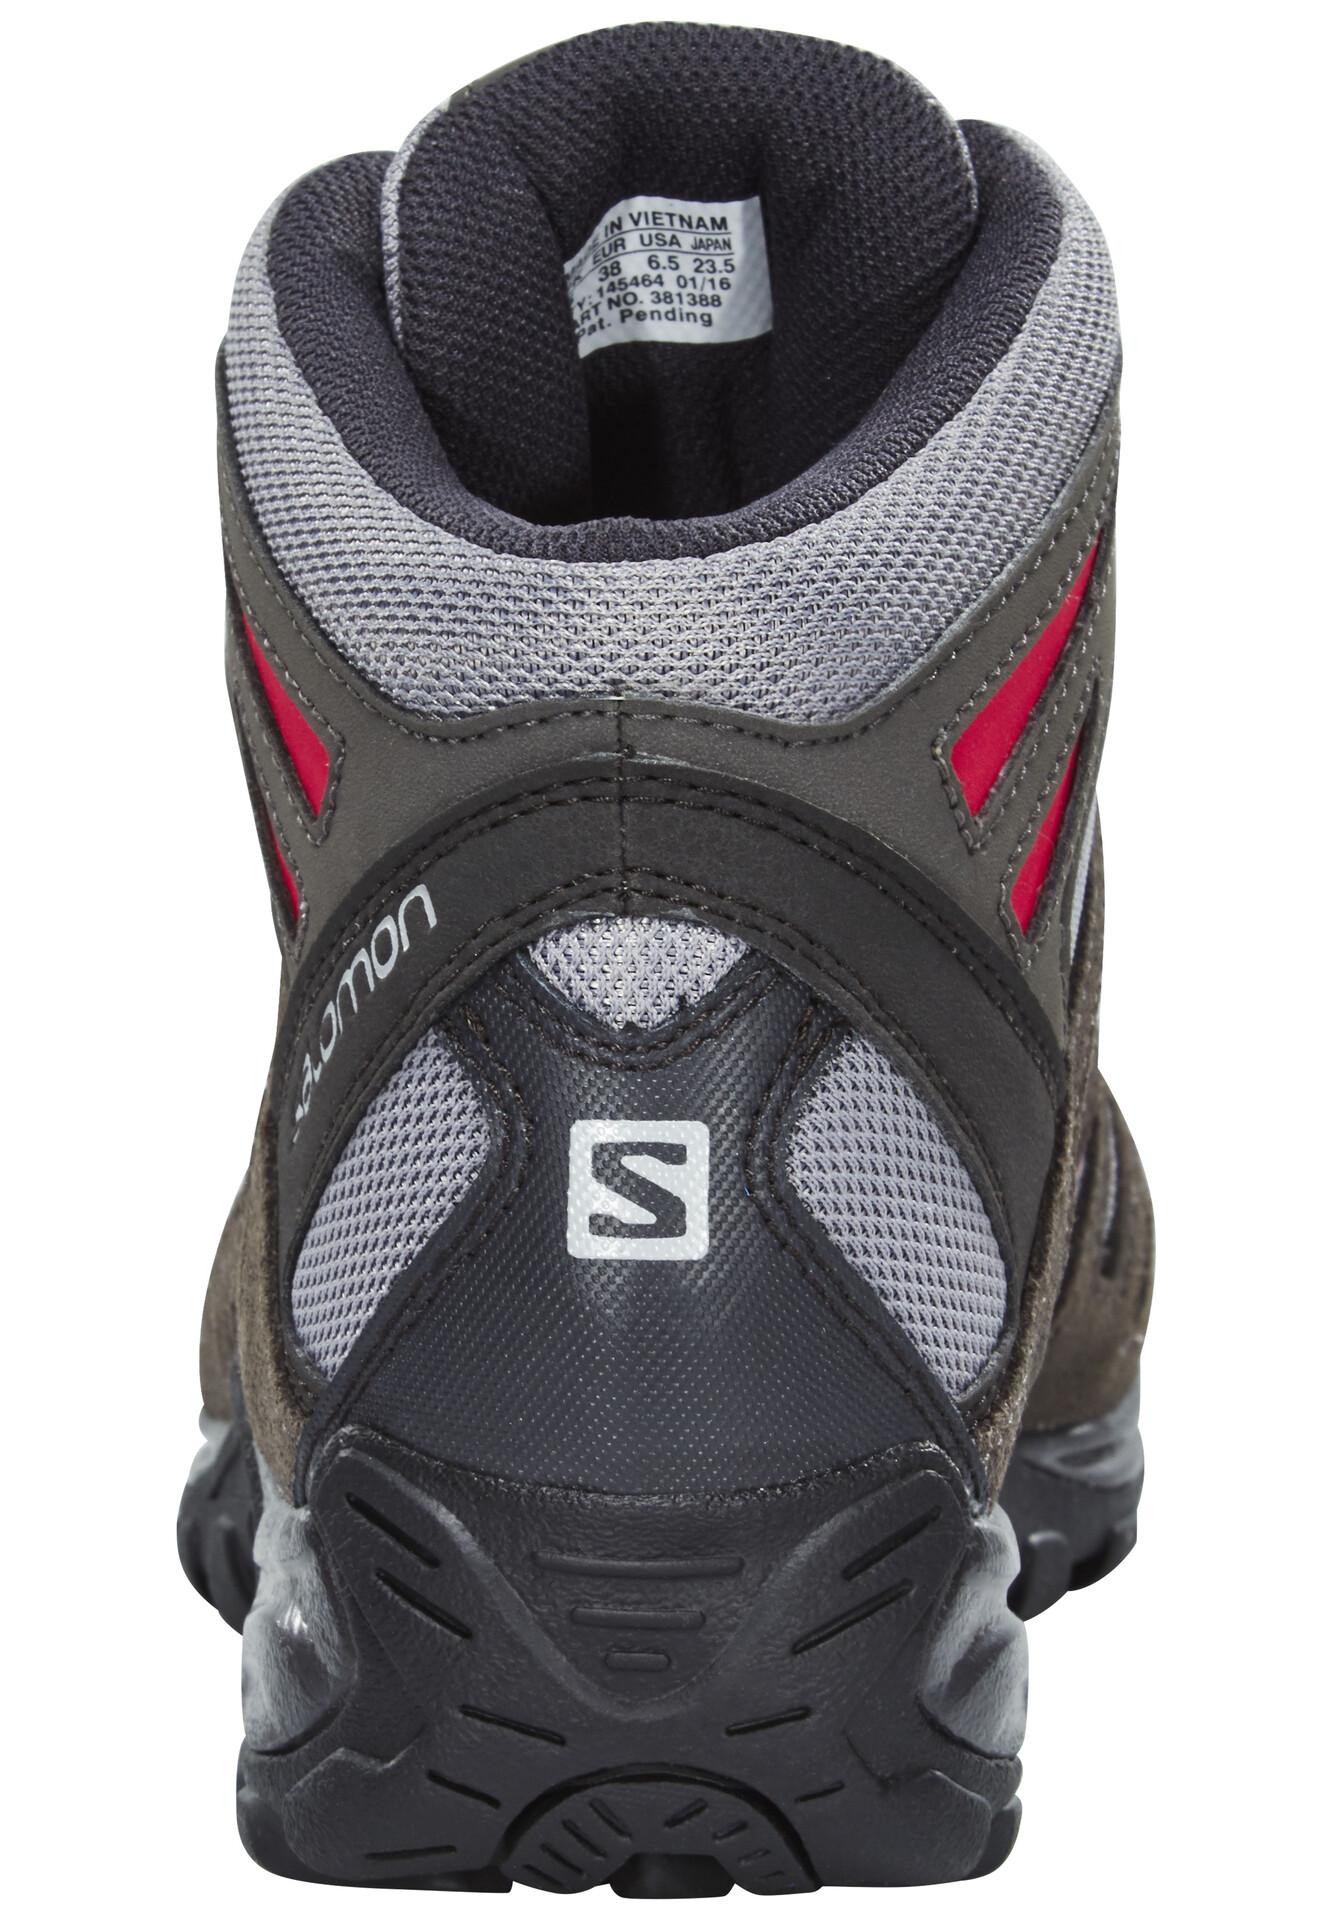 Salomon Ridgeback Mid GTX Shoes Women detroitautobahnlotus